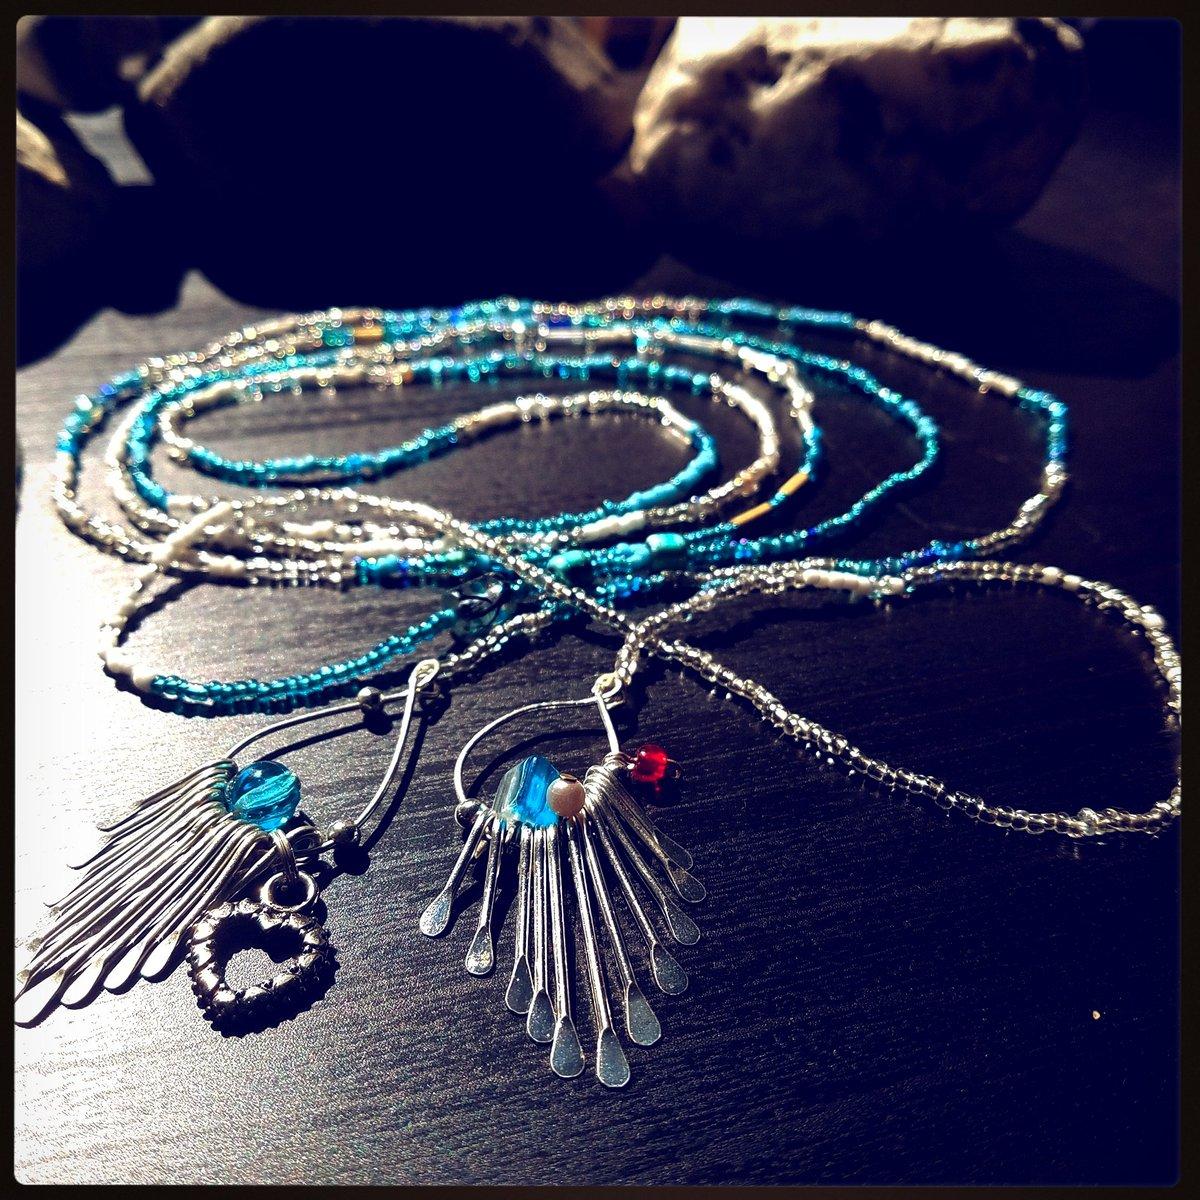 #blue #lariatnecklace before its added to inventory. Pm if interested! #etsyRT #etsyretwt #epiconetsy #etsyspecialt #bohojewelry #bohostyle<br>http://pic.twitter.com/JqMPNrY0wA